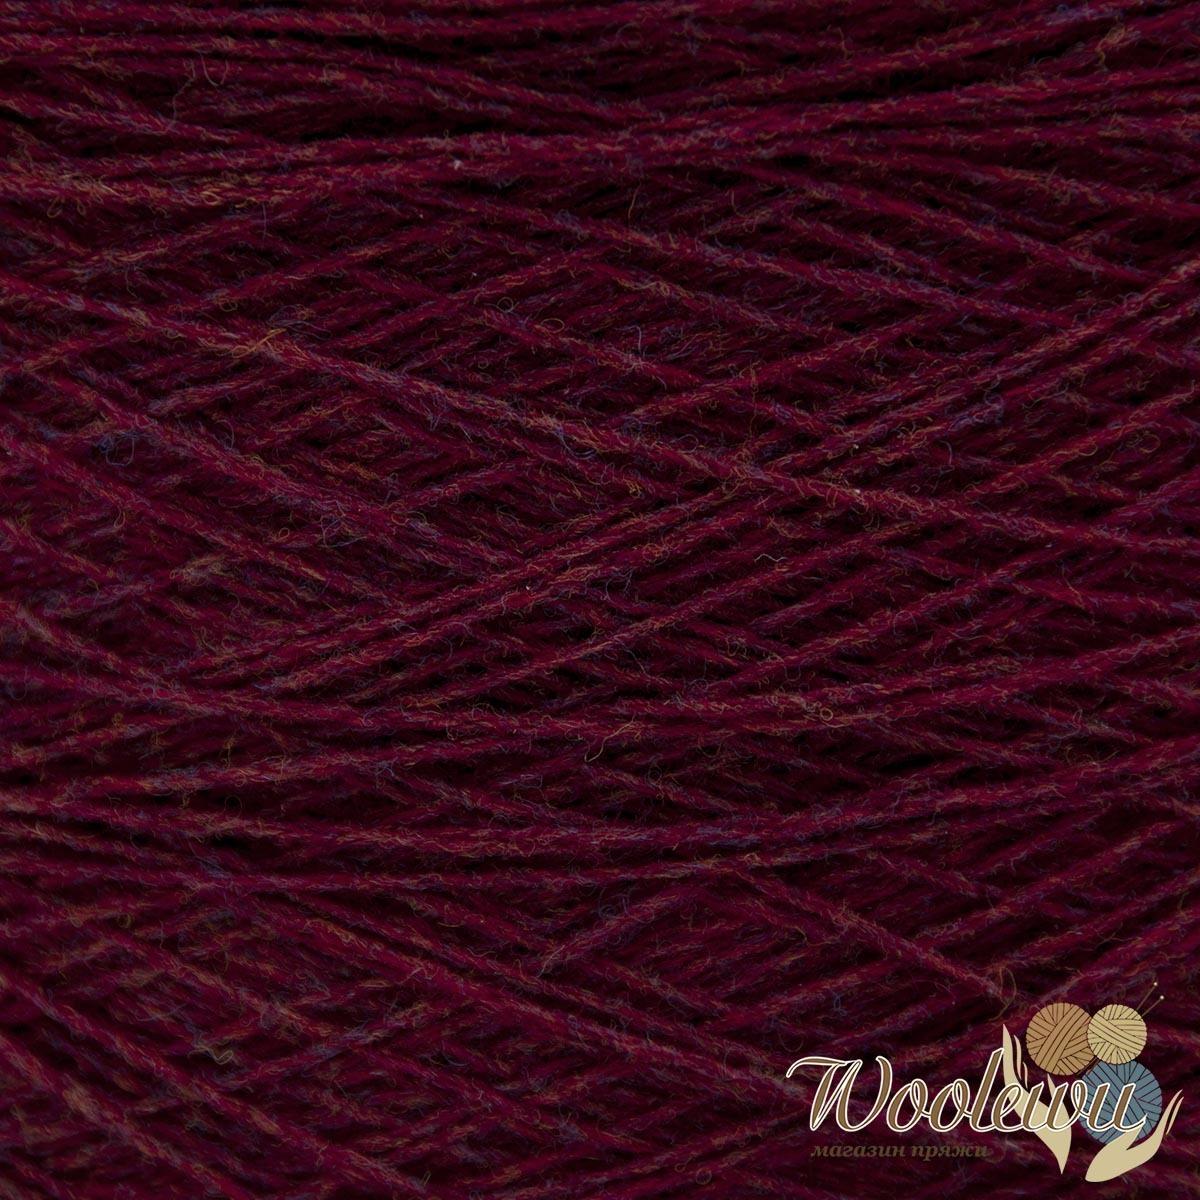 Knoll Yarns Merino Lambswool - 262